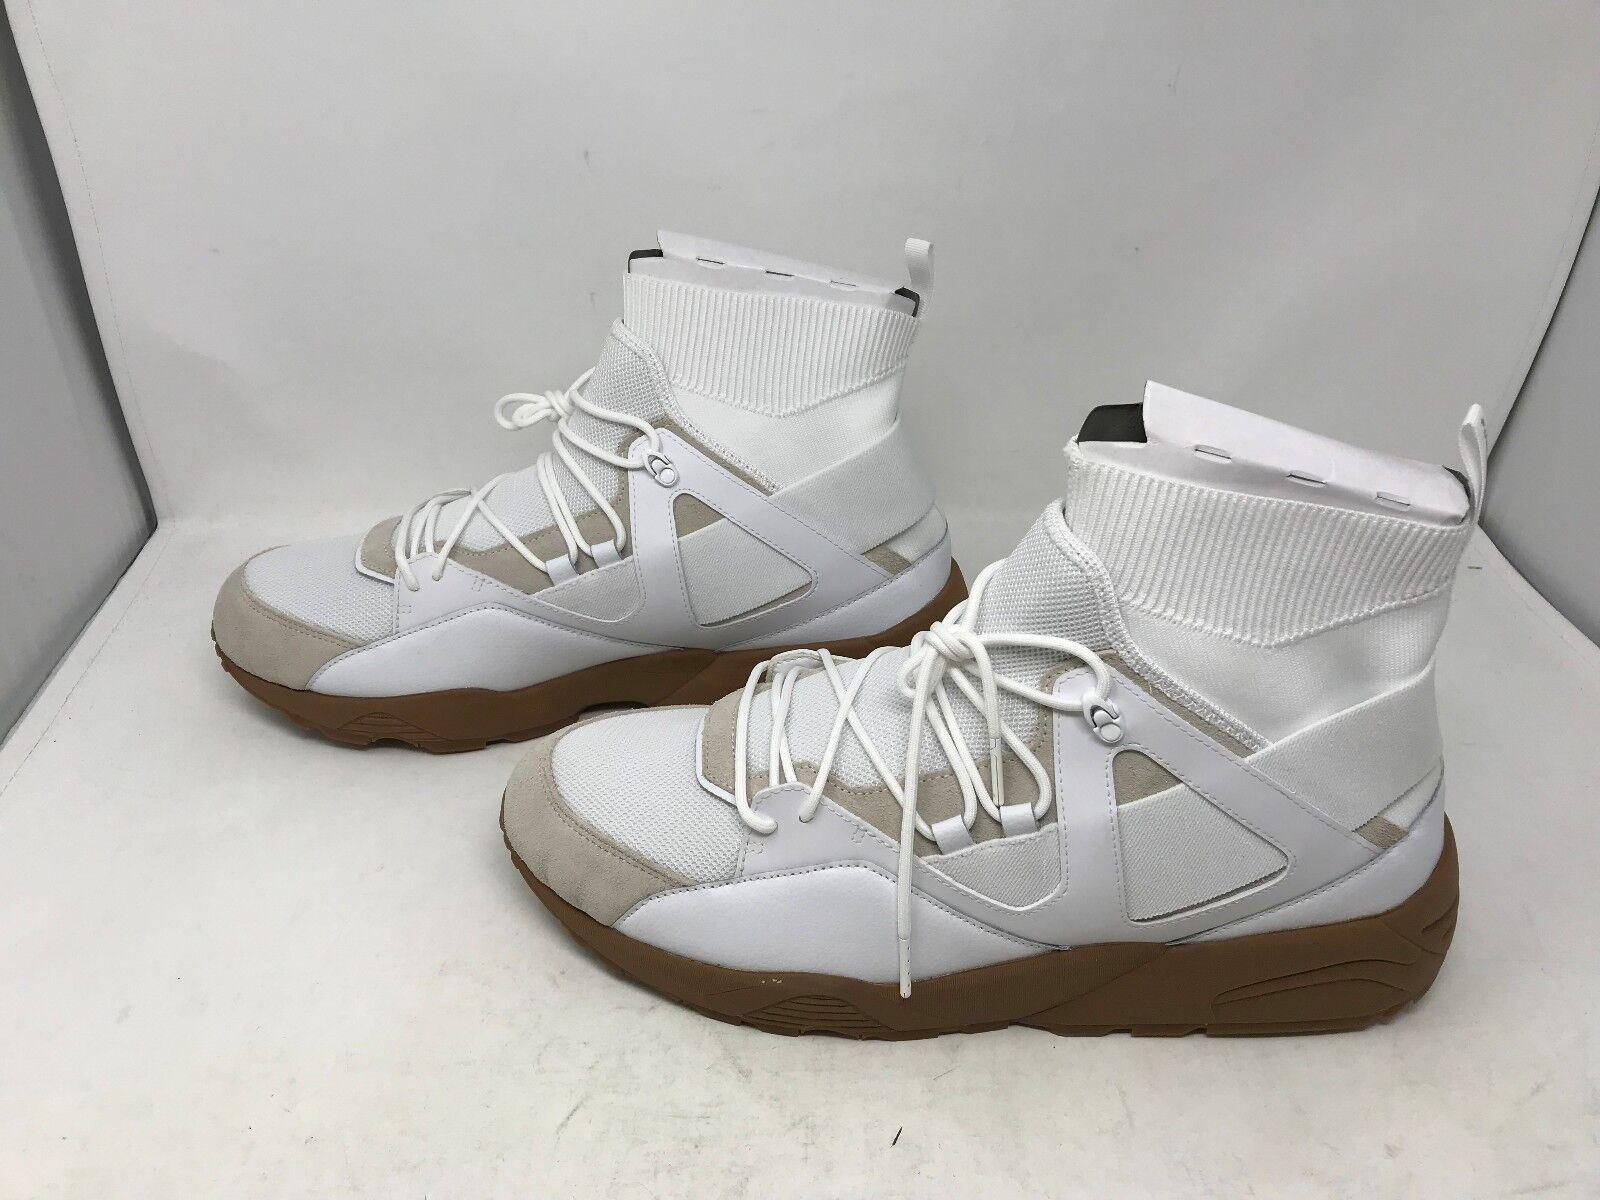 Mens Puma Price reduction B.O.G Sock SNKB HAN Shoes Price reduction